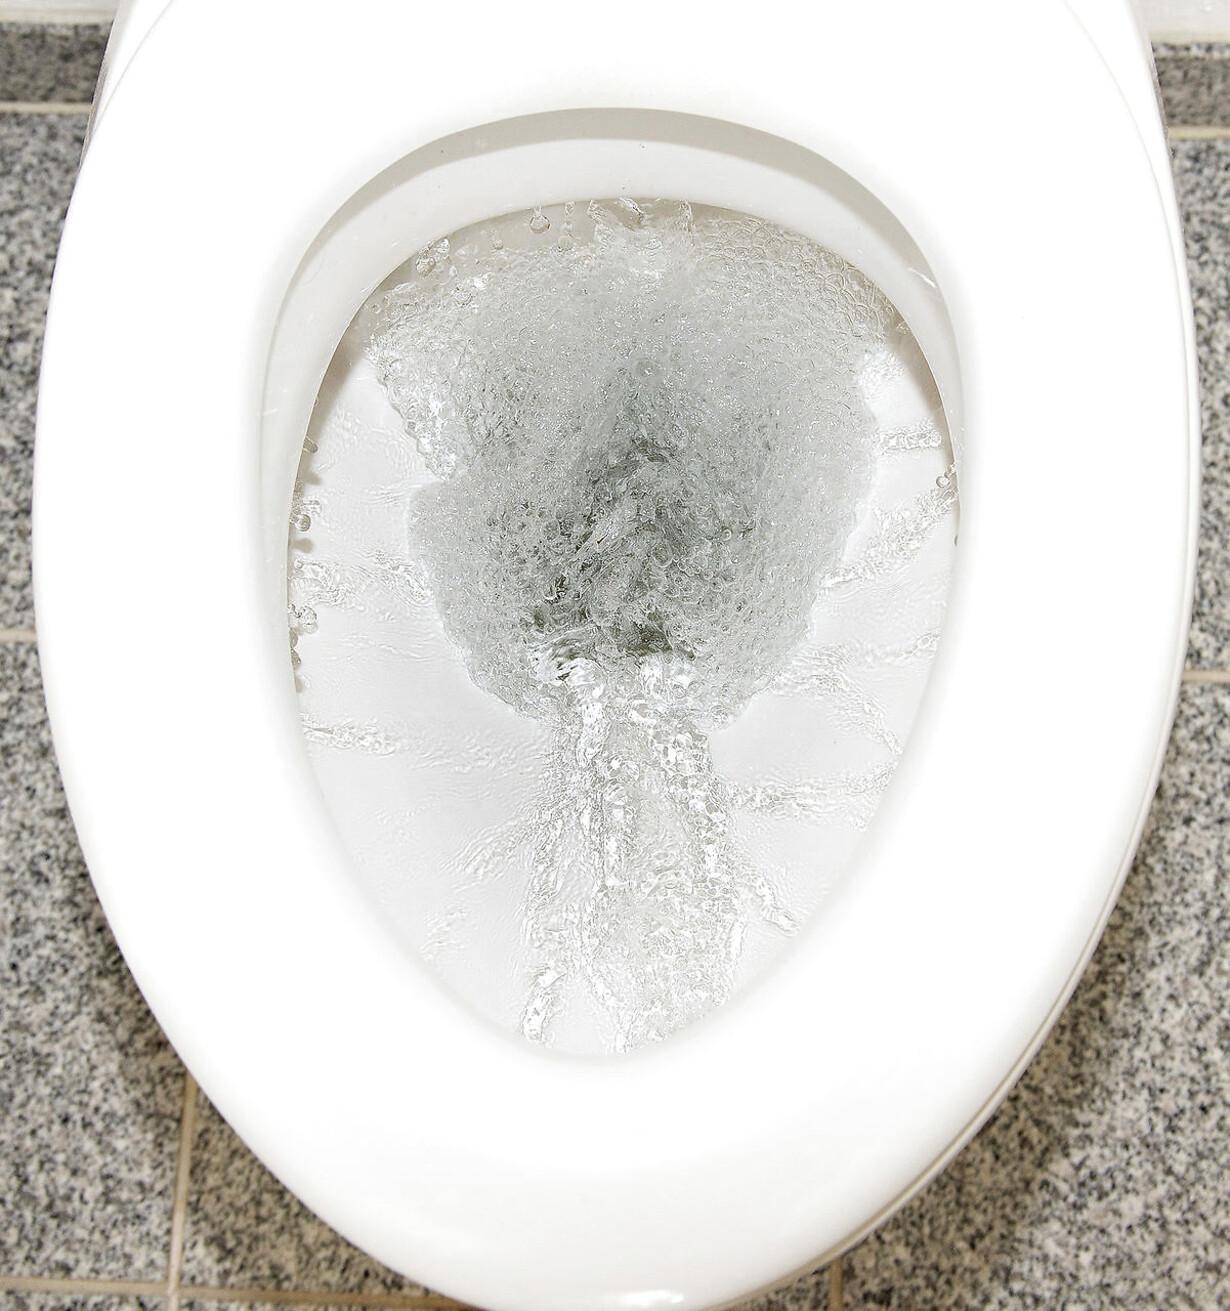 Toiletspray